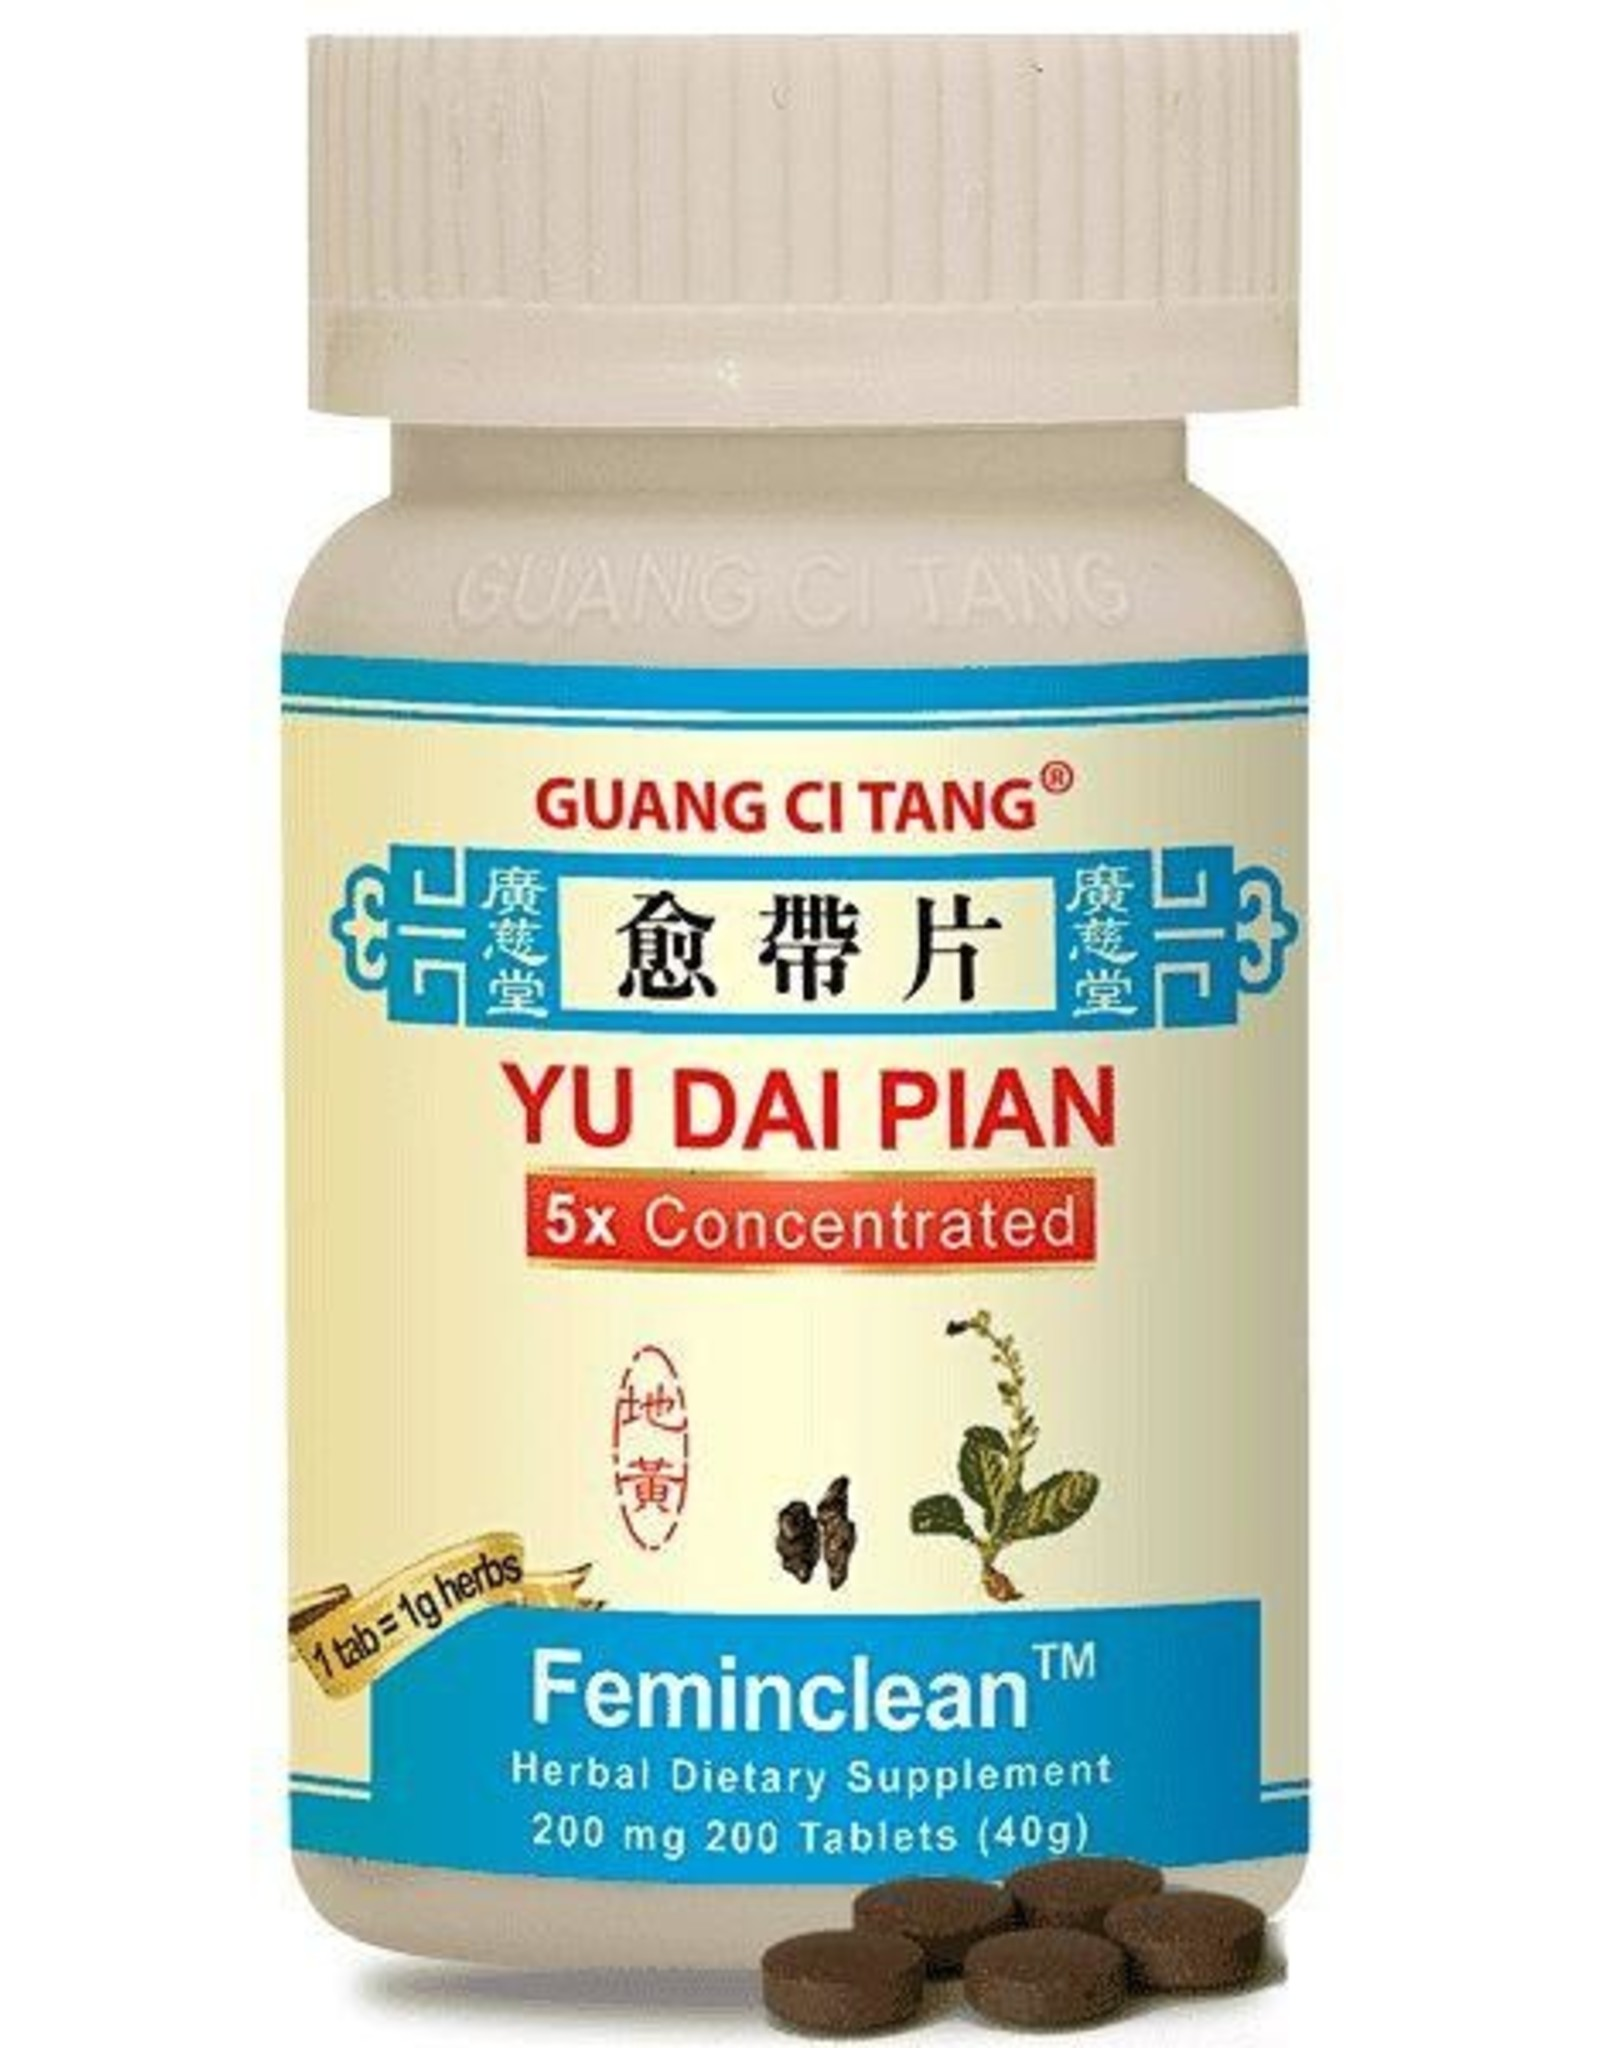 ActiveHerb Yu Dai Pian - Feminclean